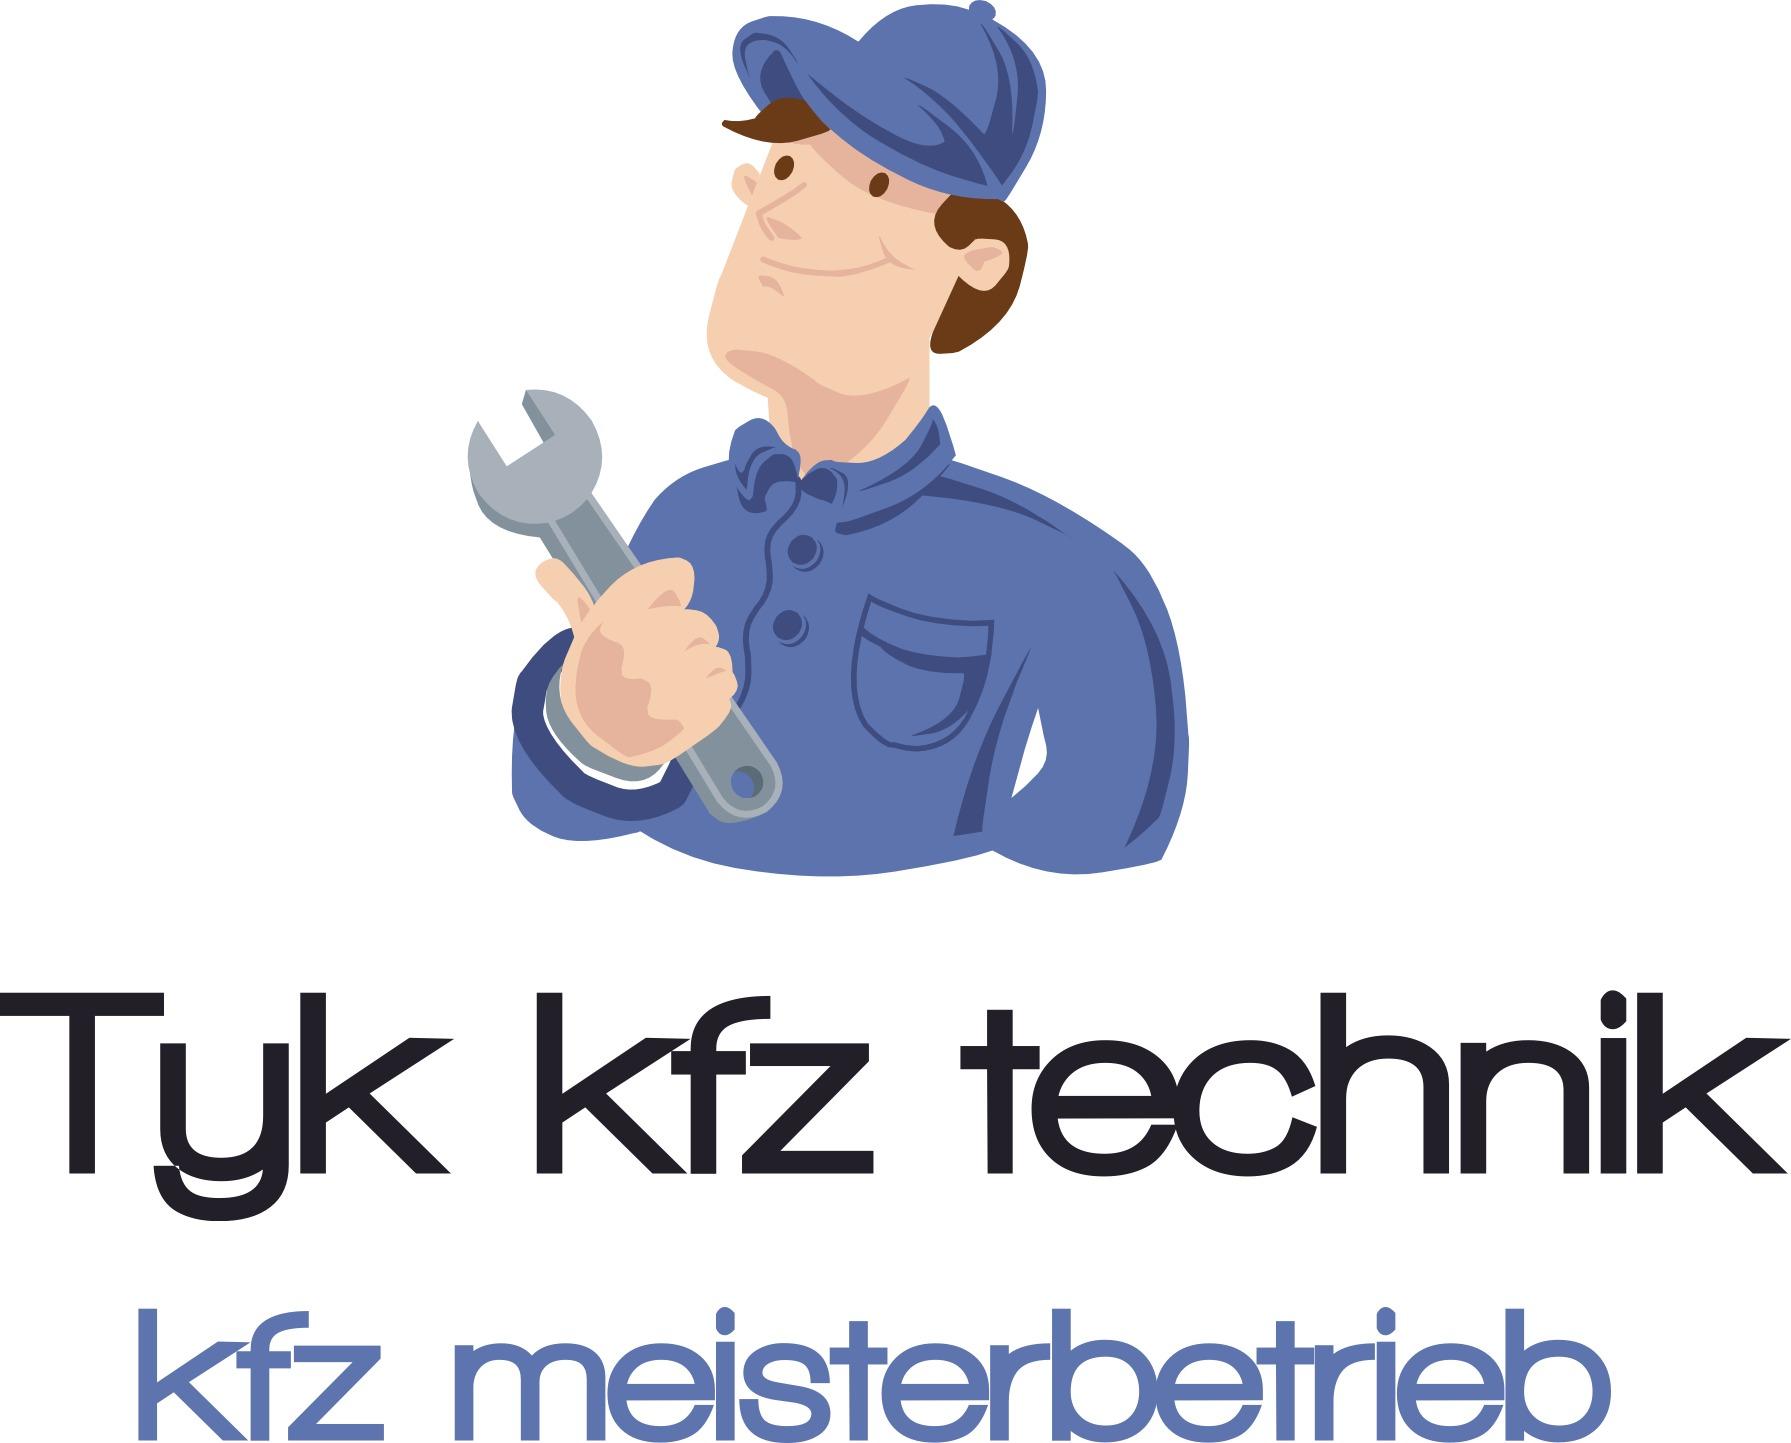 TYK Kfz-Technik logo